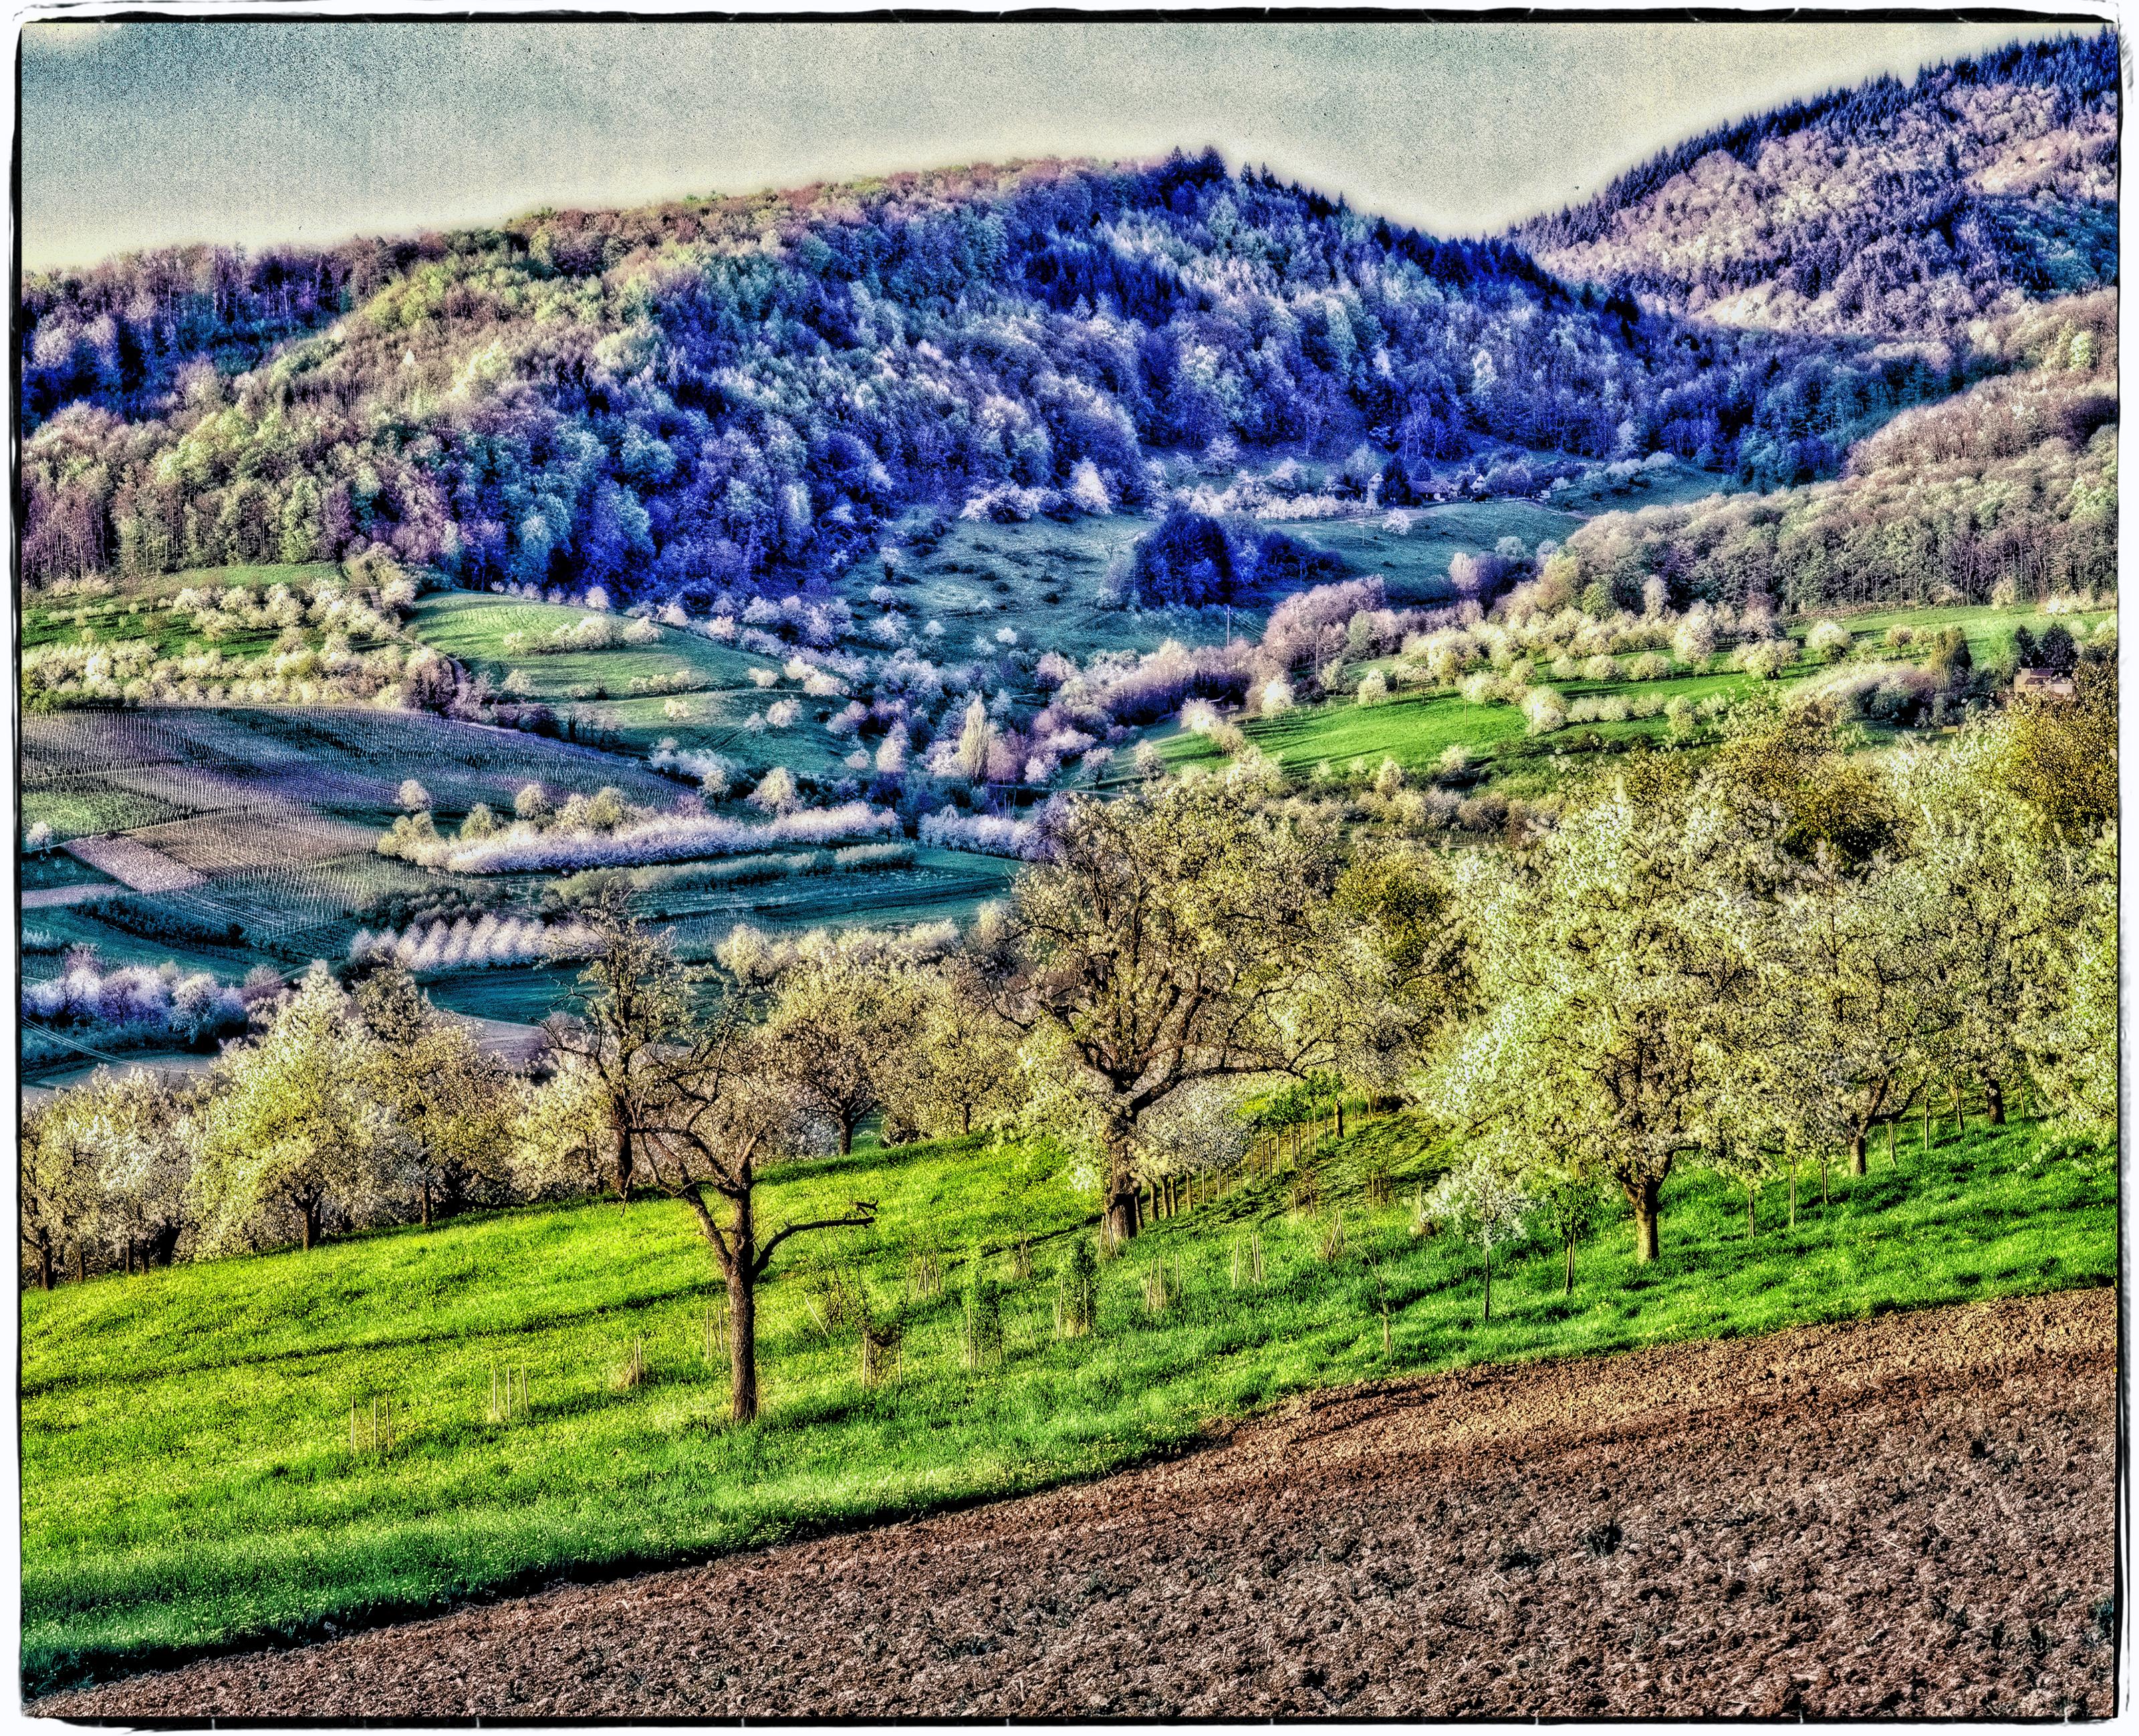 cherry blosom season in the valley of Obereggenen